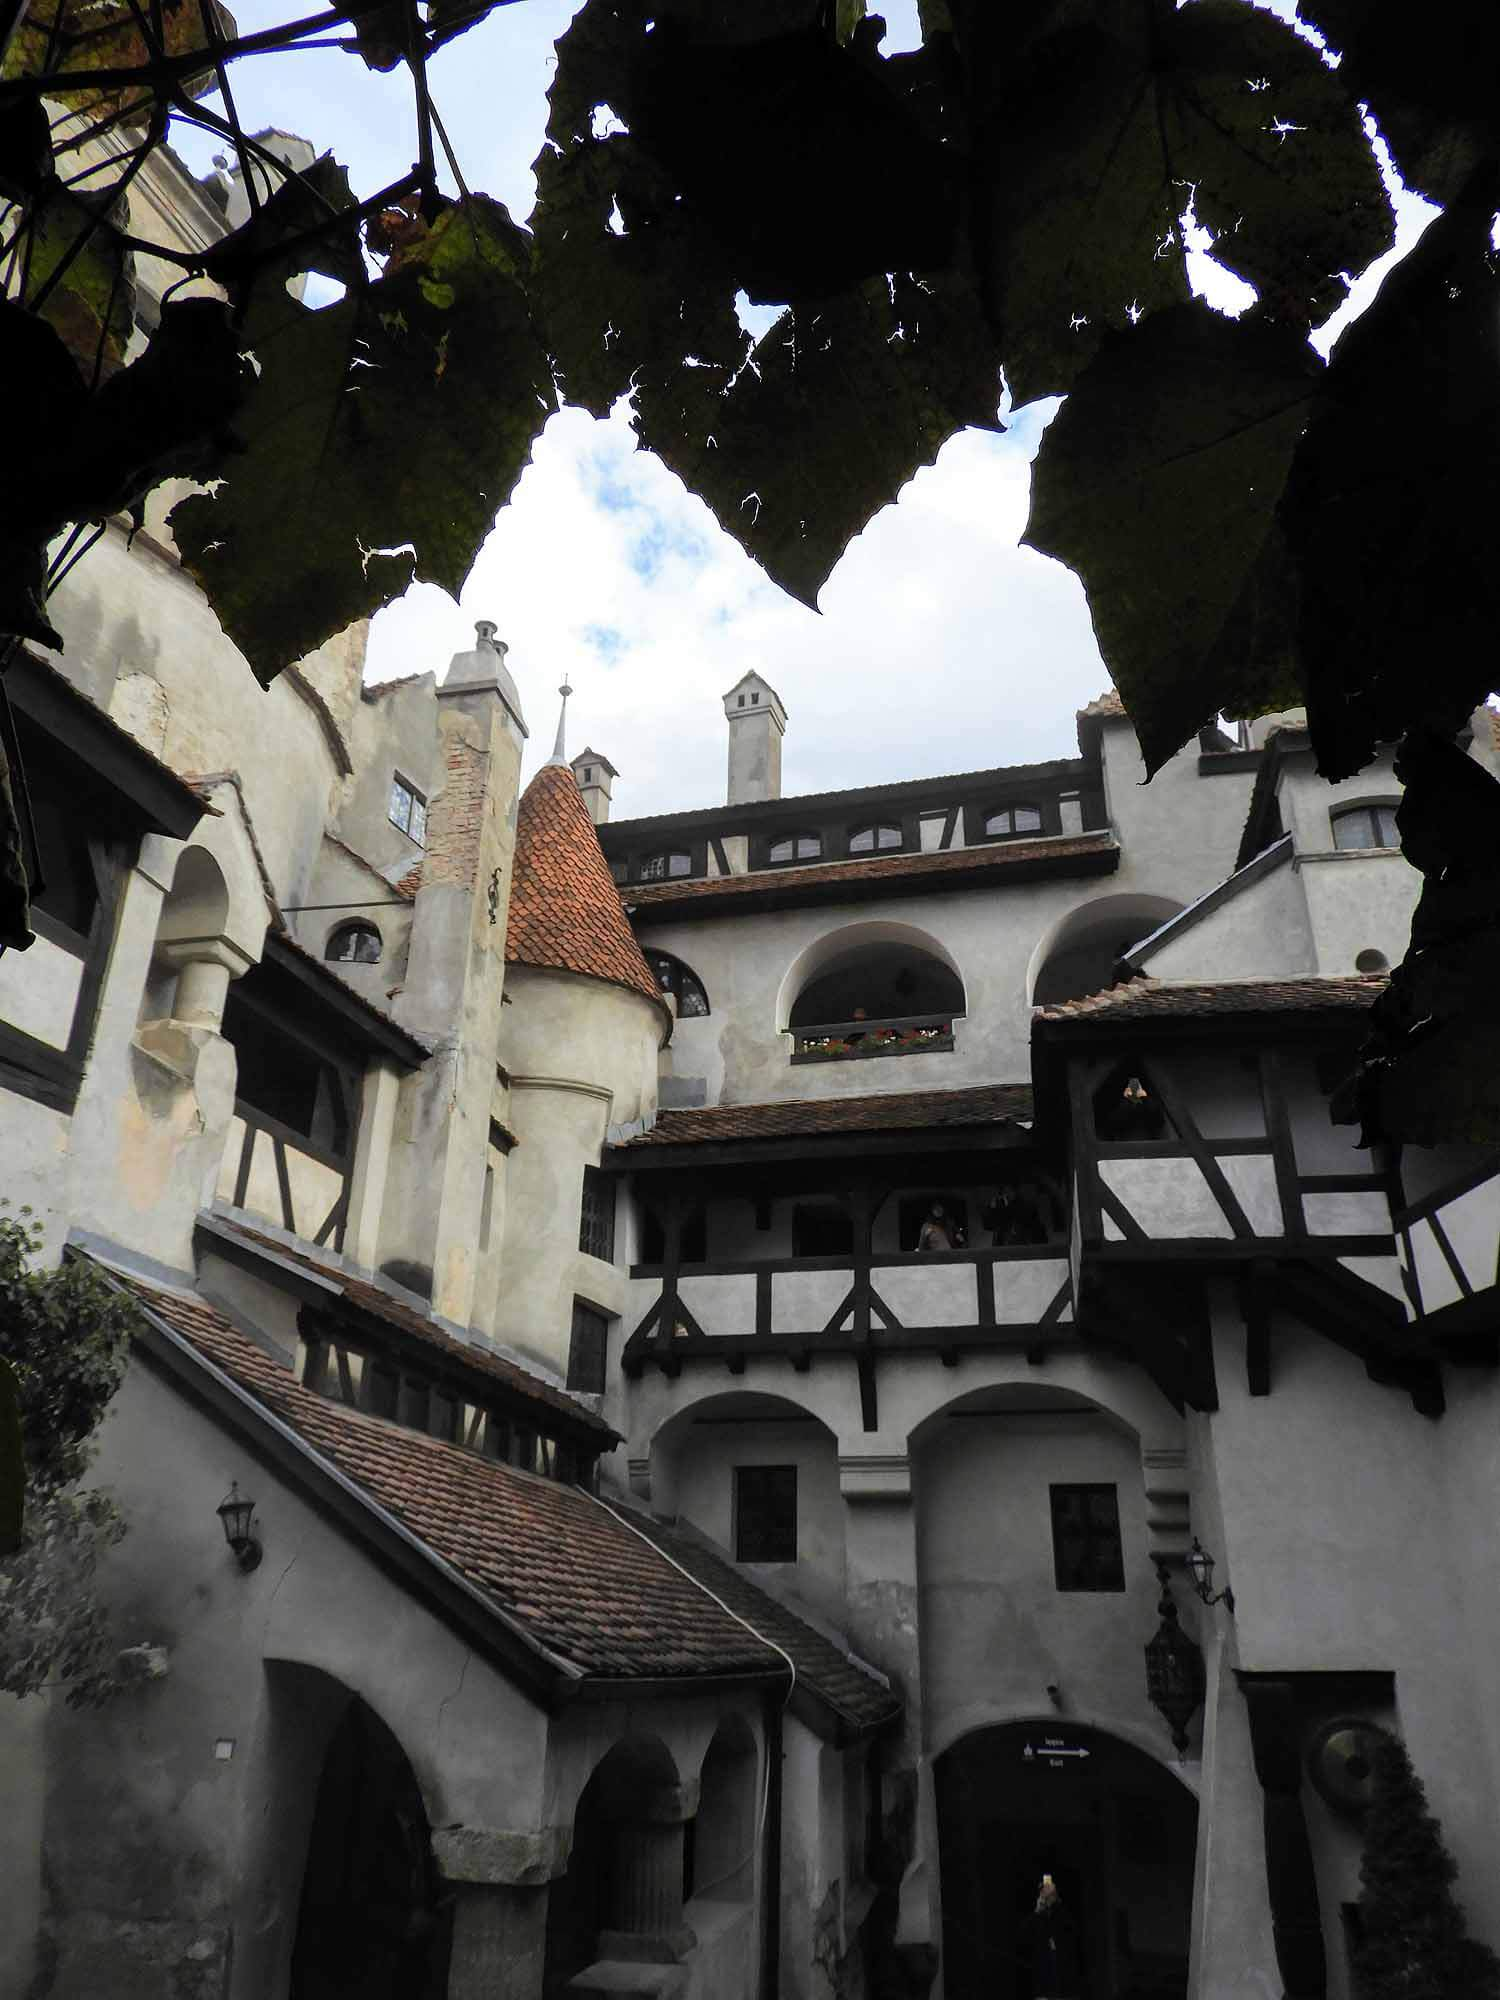 romania-bran-castle-courtyard-vines.jpg